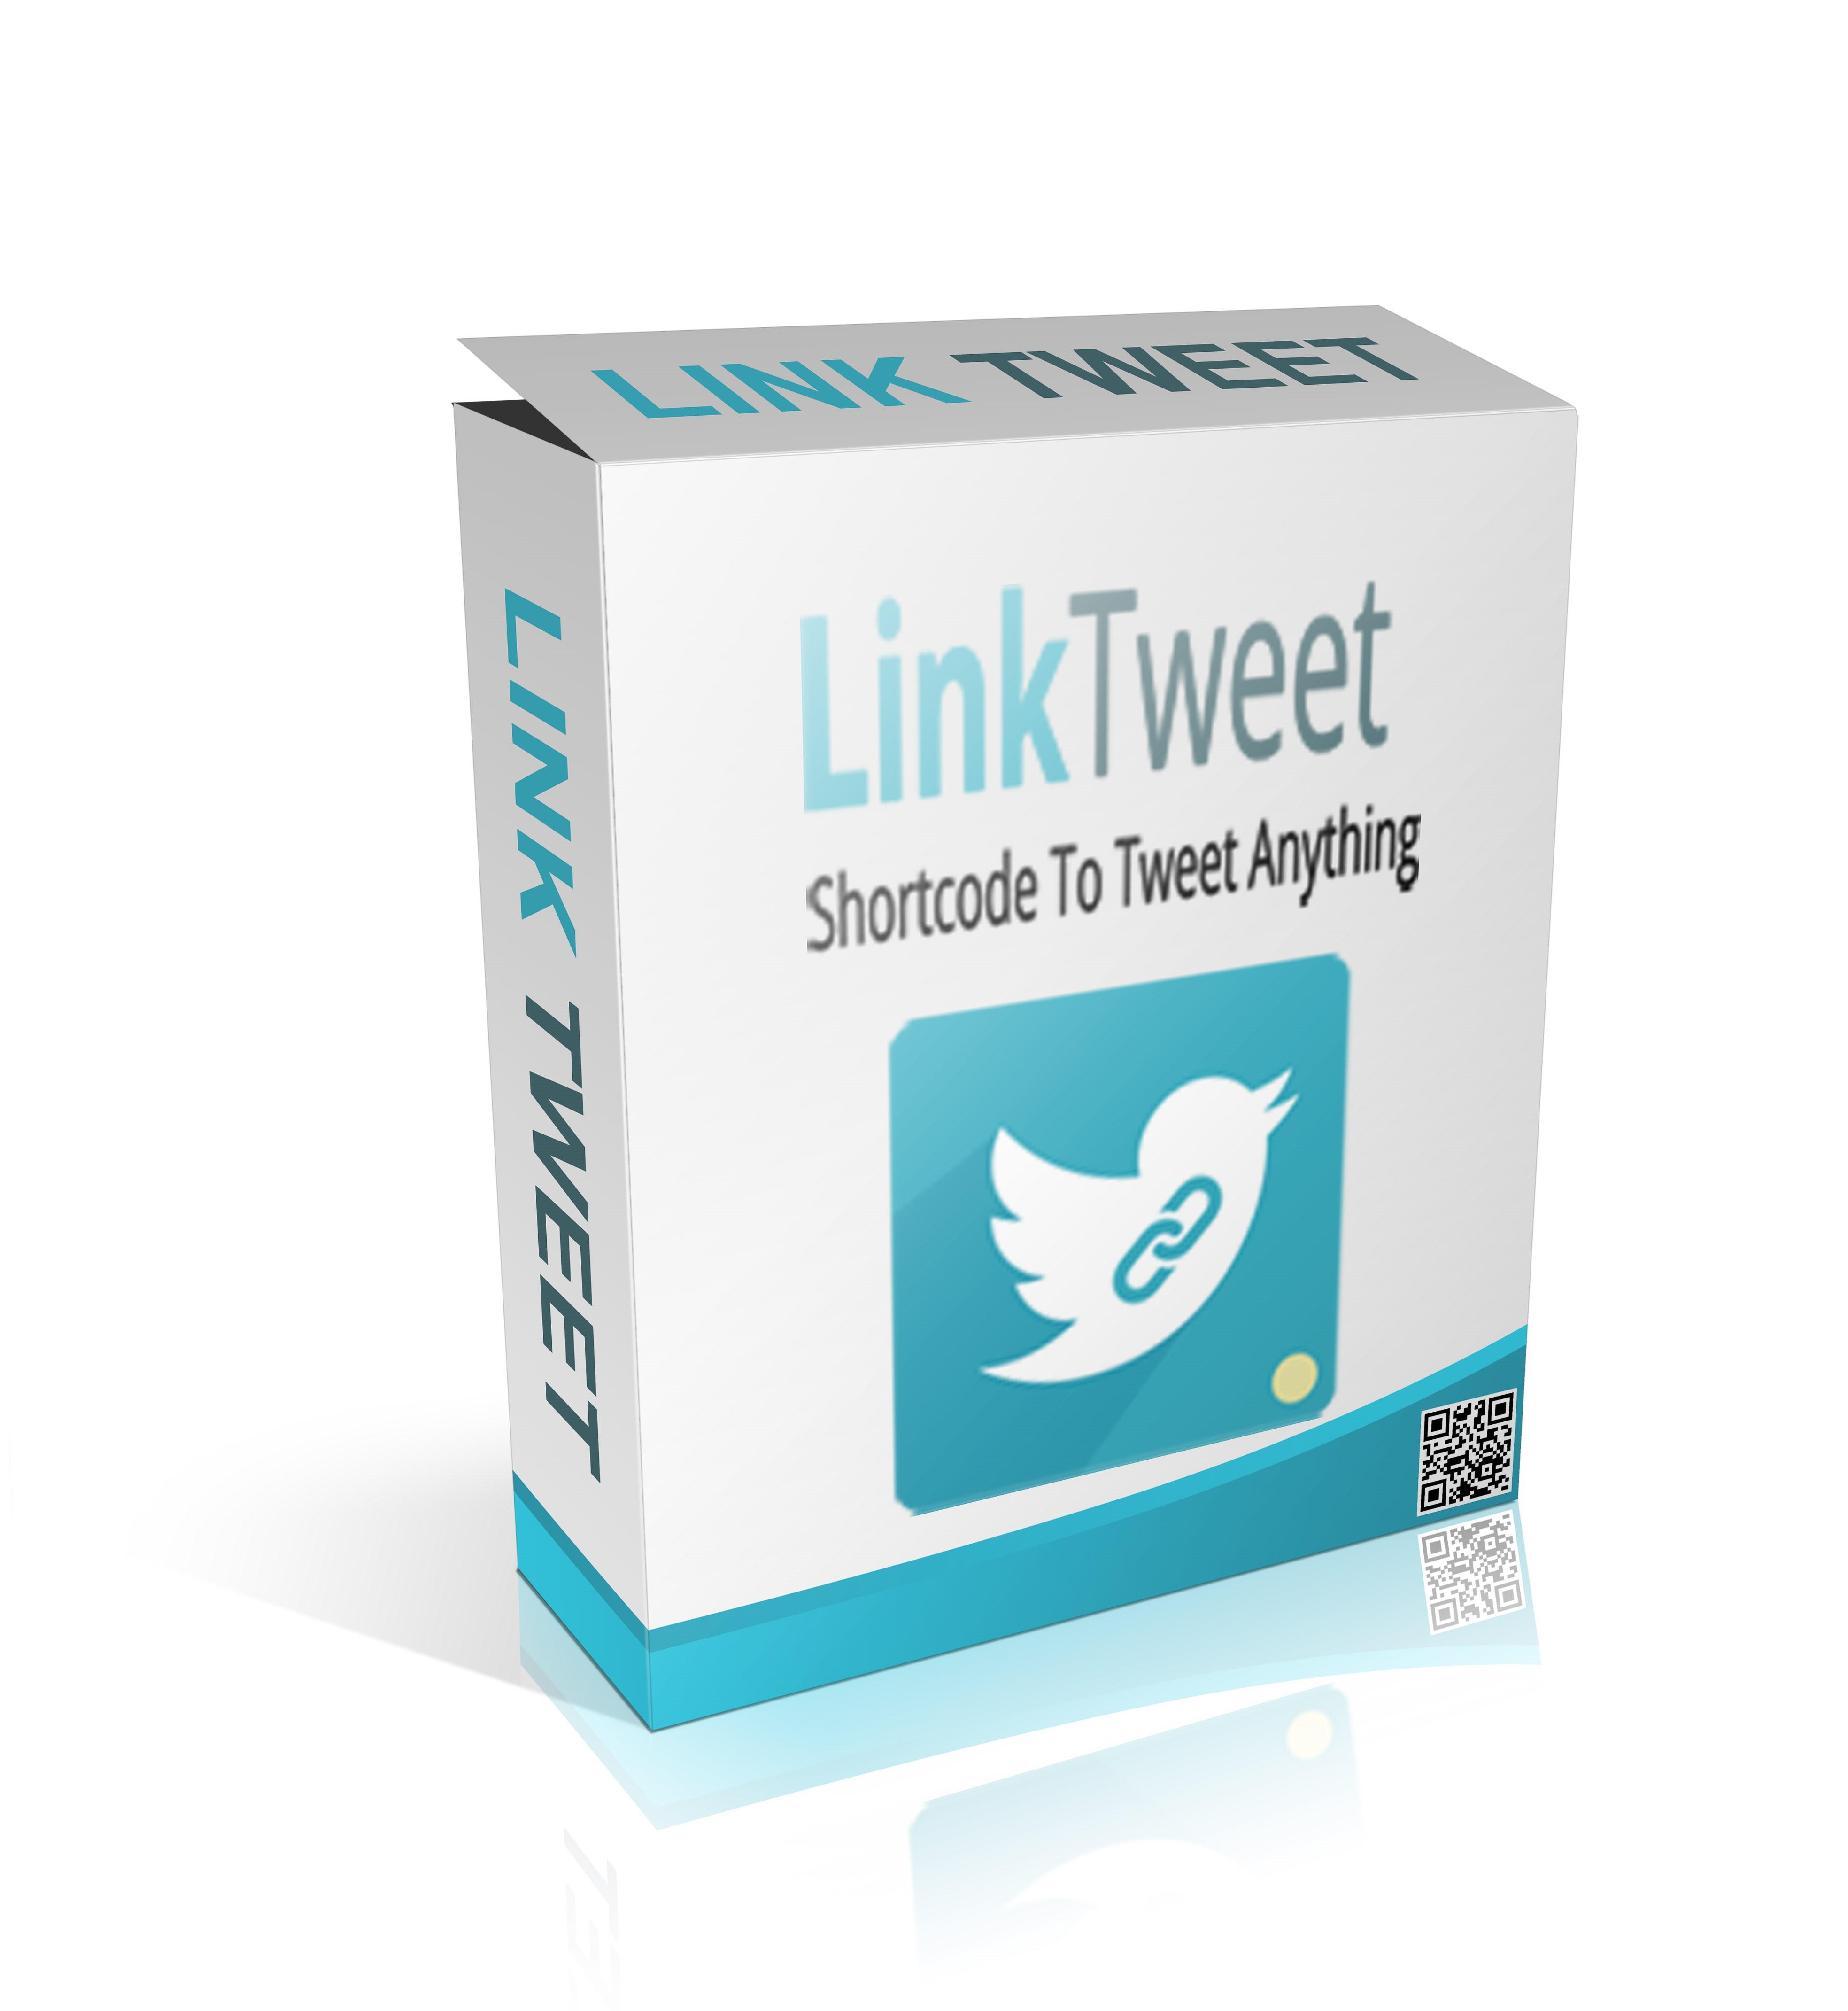 Link Tweet it super duper easy to tweet